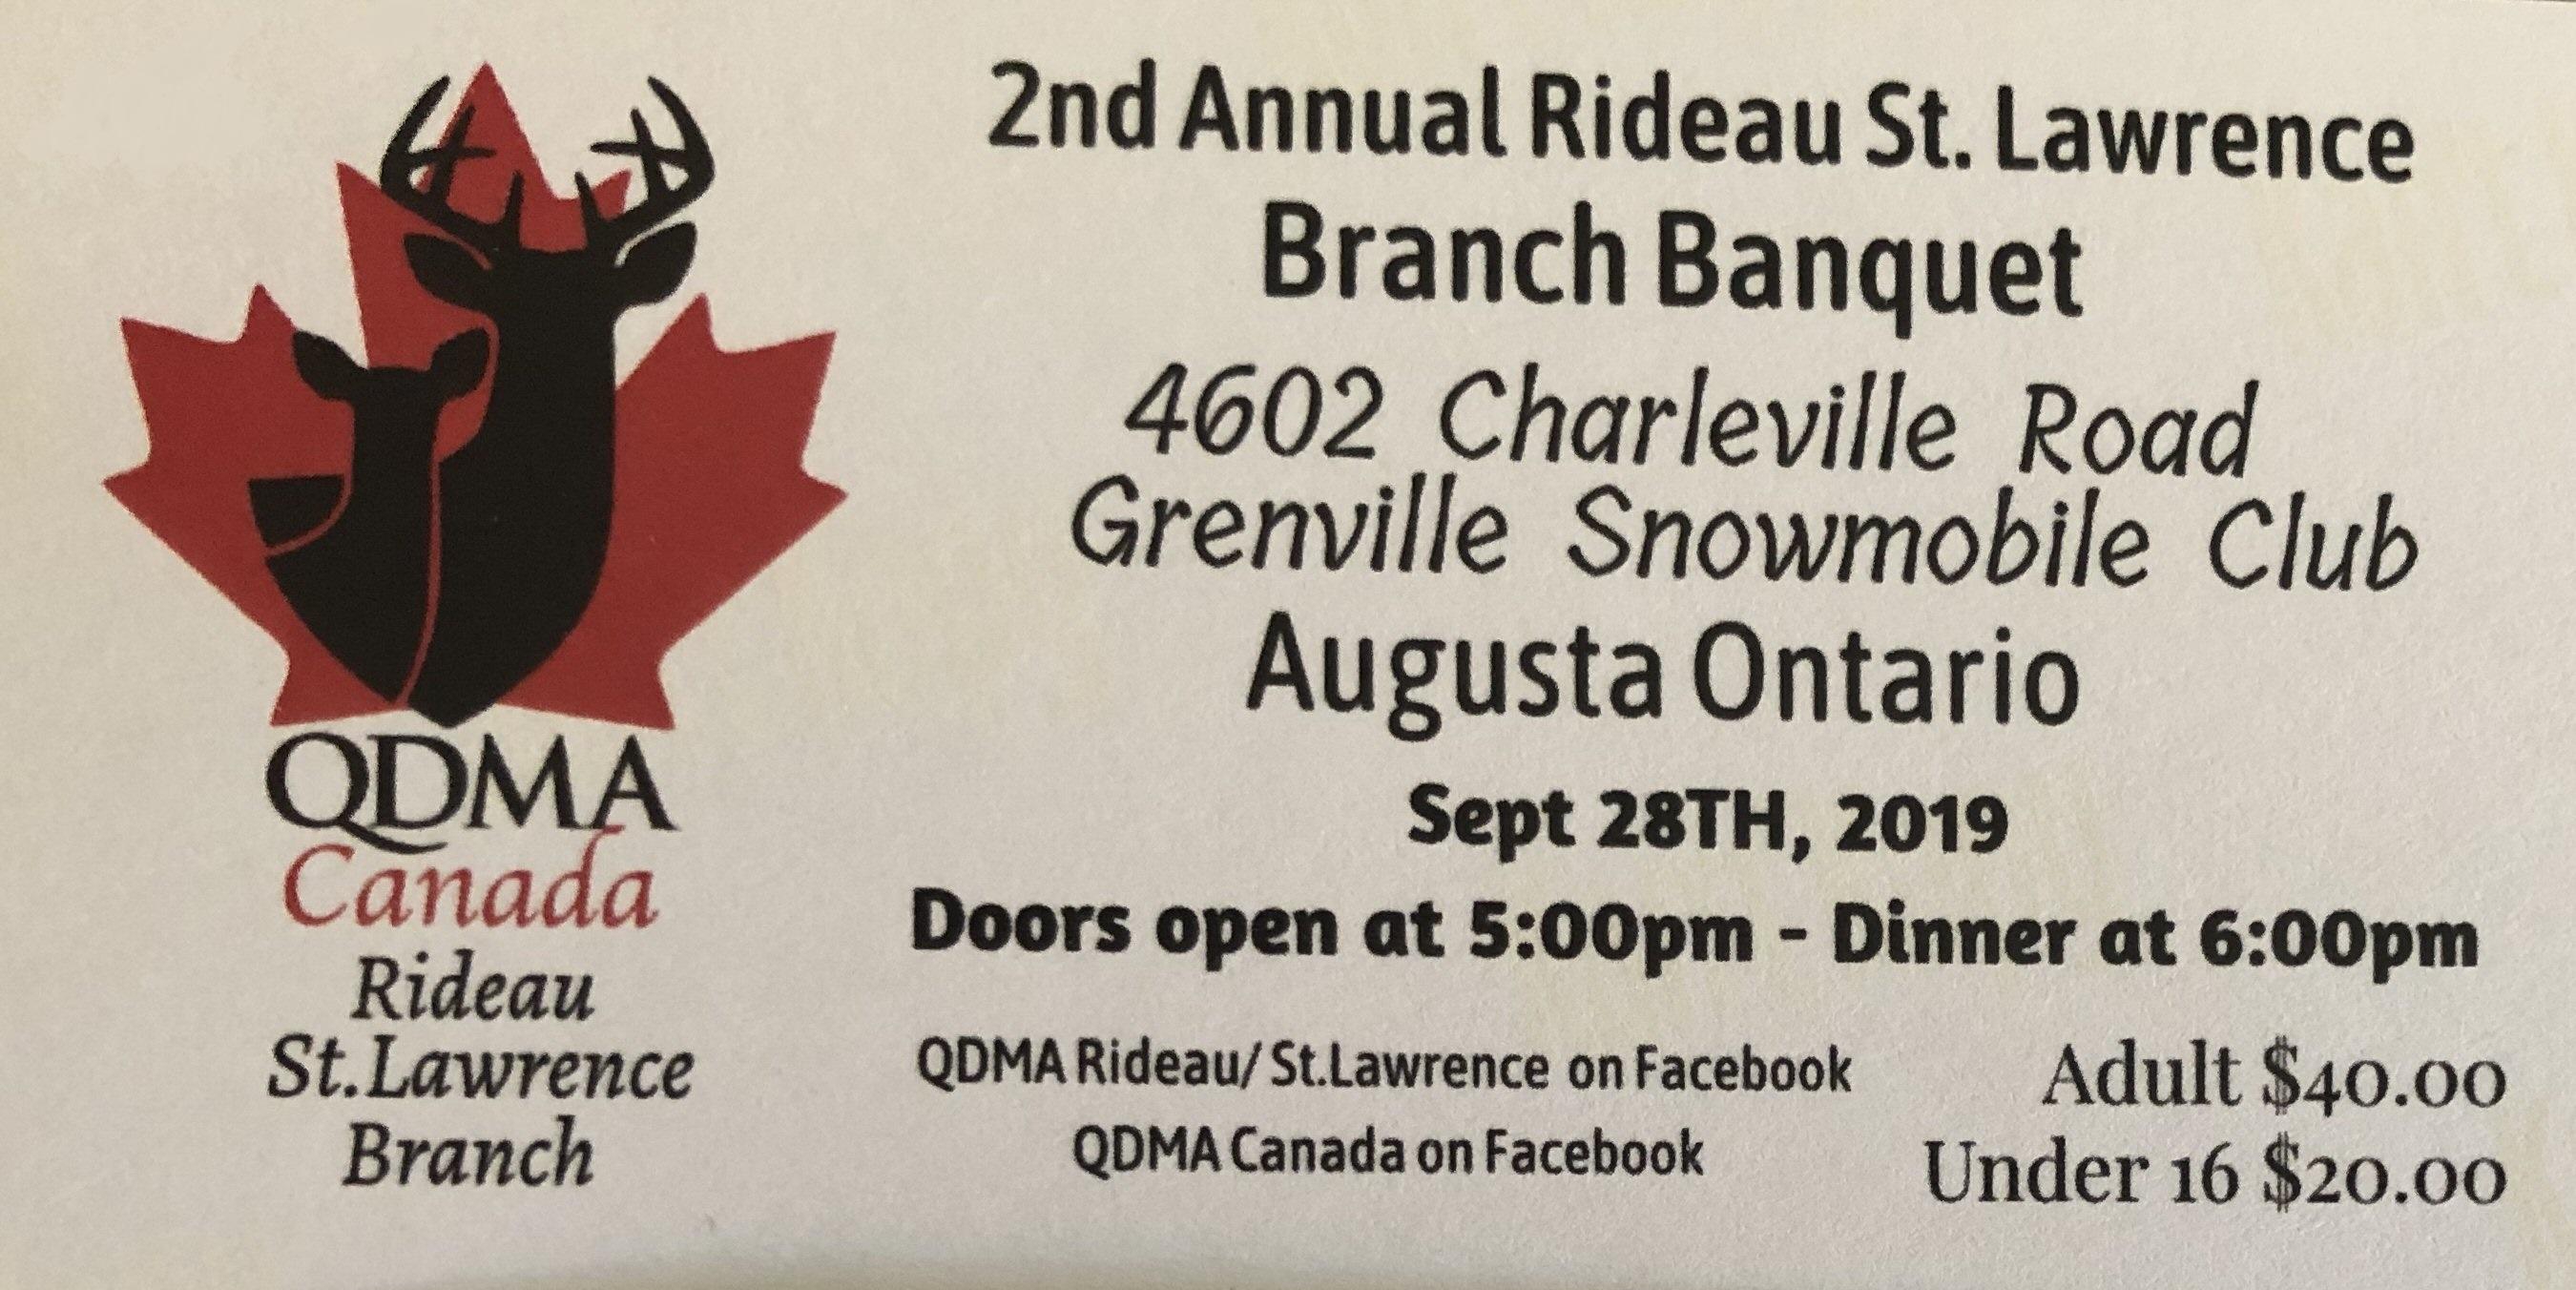 Quality Deer Management Association Banquet @ Grenville Snowmobile Club | Ontario | Canada